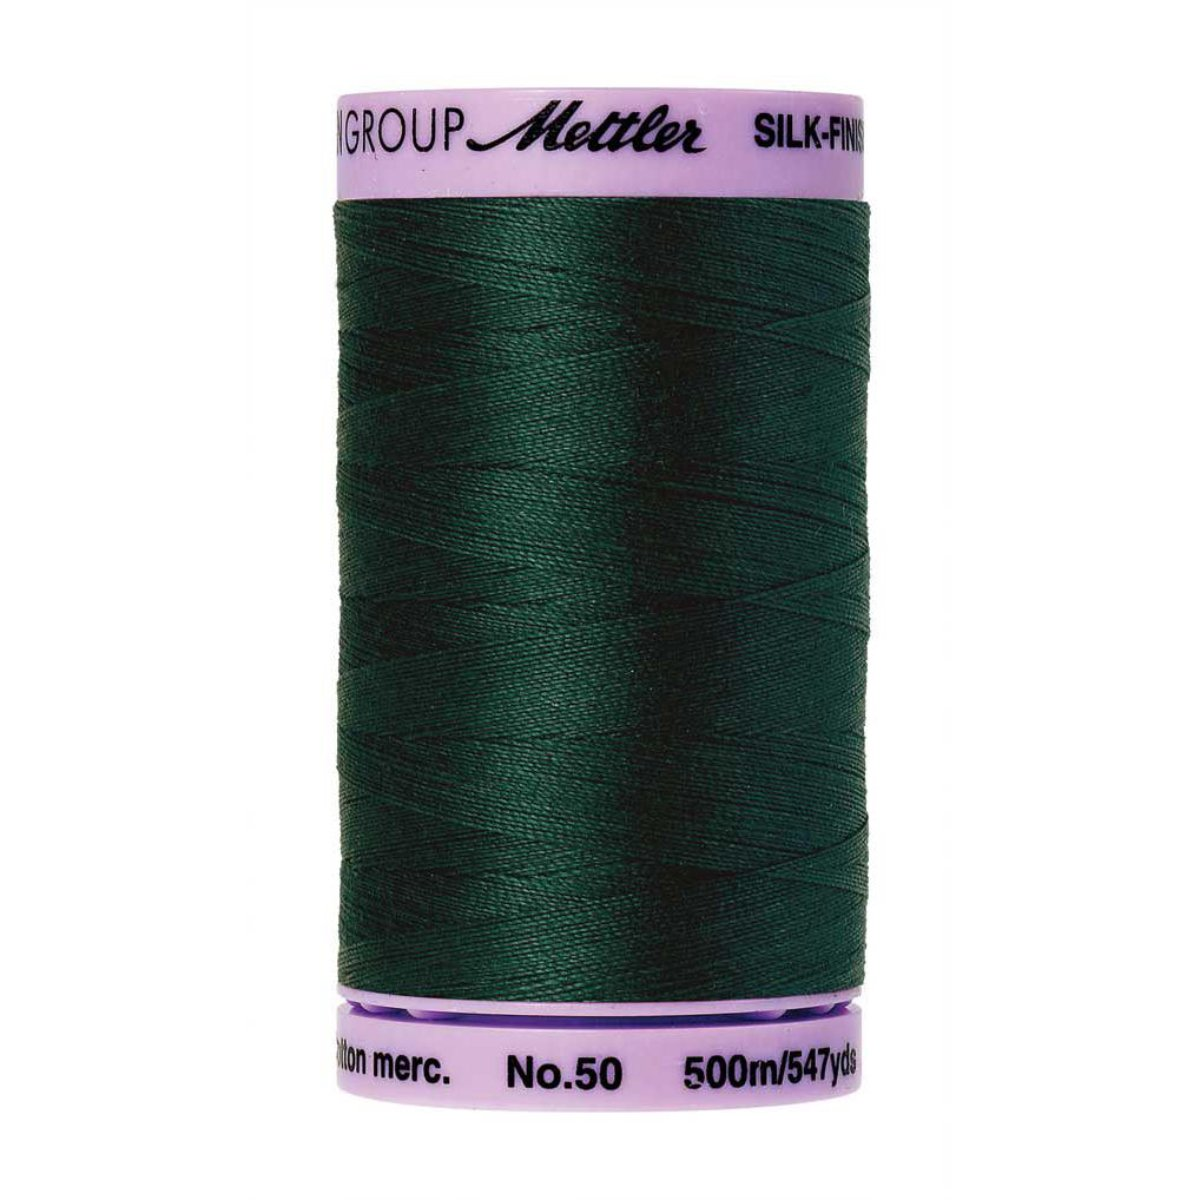 Mettler Silk Finish Cotton Thread Swamp